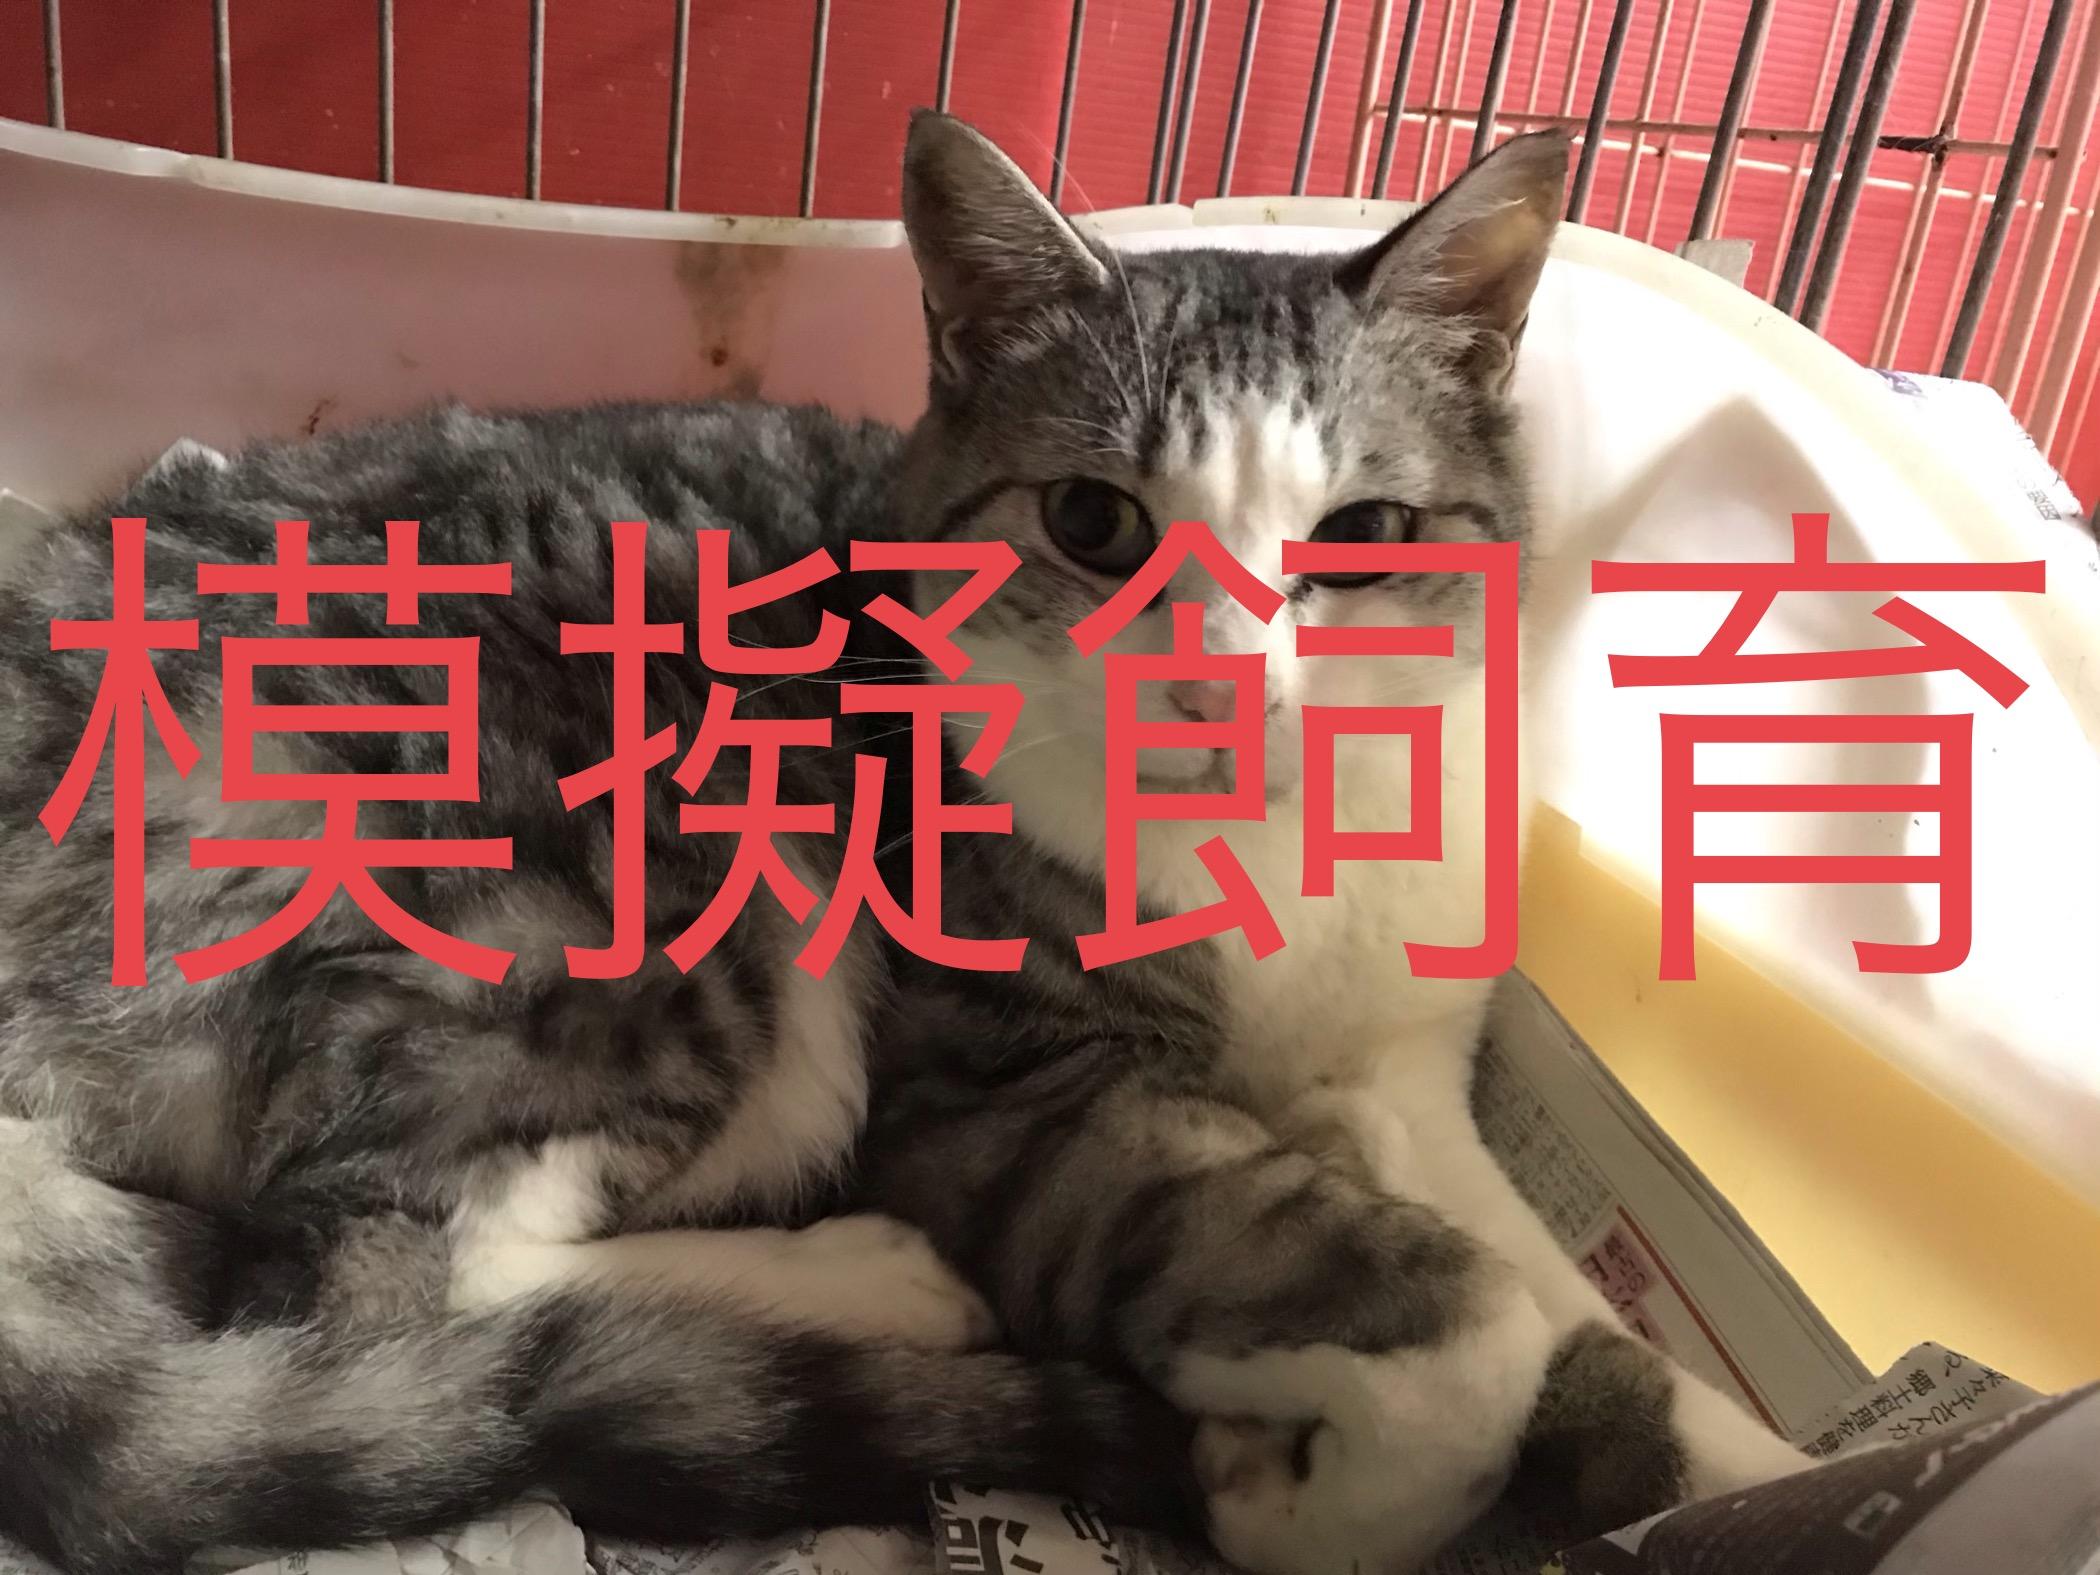 <p></p> <ul> <li>猫種:日本猫 サバ グレー白</li> <li>性別:男の子</li> <li>名前:すみ</li> <li>年齢:4歳</li> <li>保護経緯:飼い主様が海外転勤ため飼育困難になった</li> </ul>